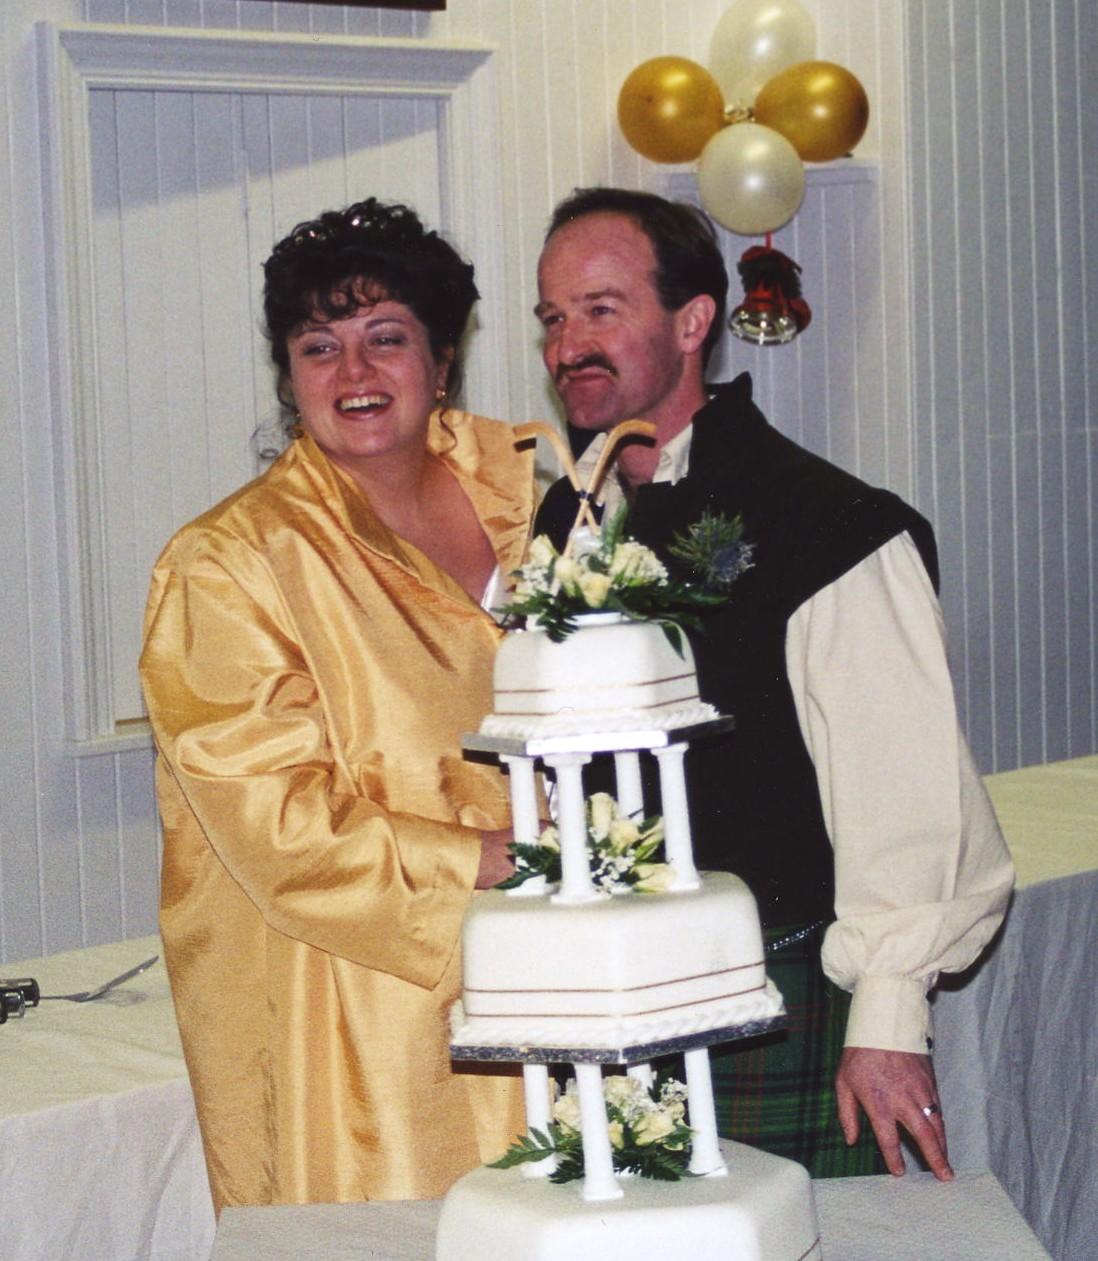 Duncan Crawford & Rhona Cocker's Wedding